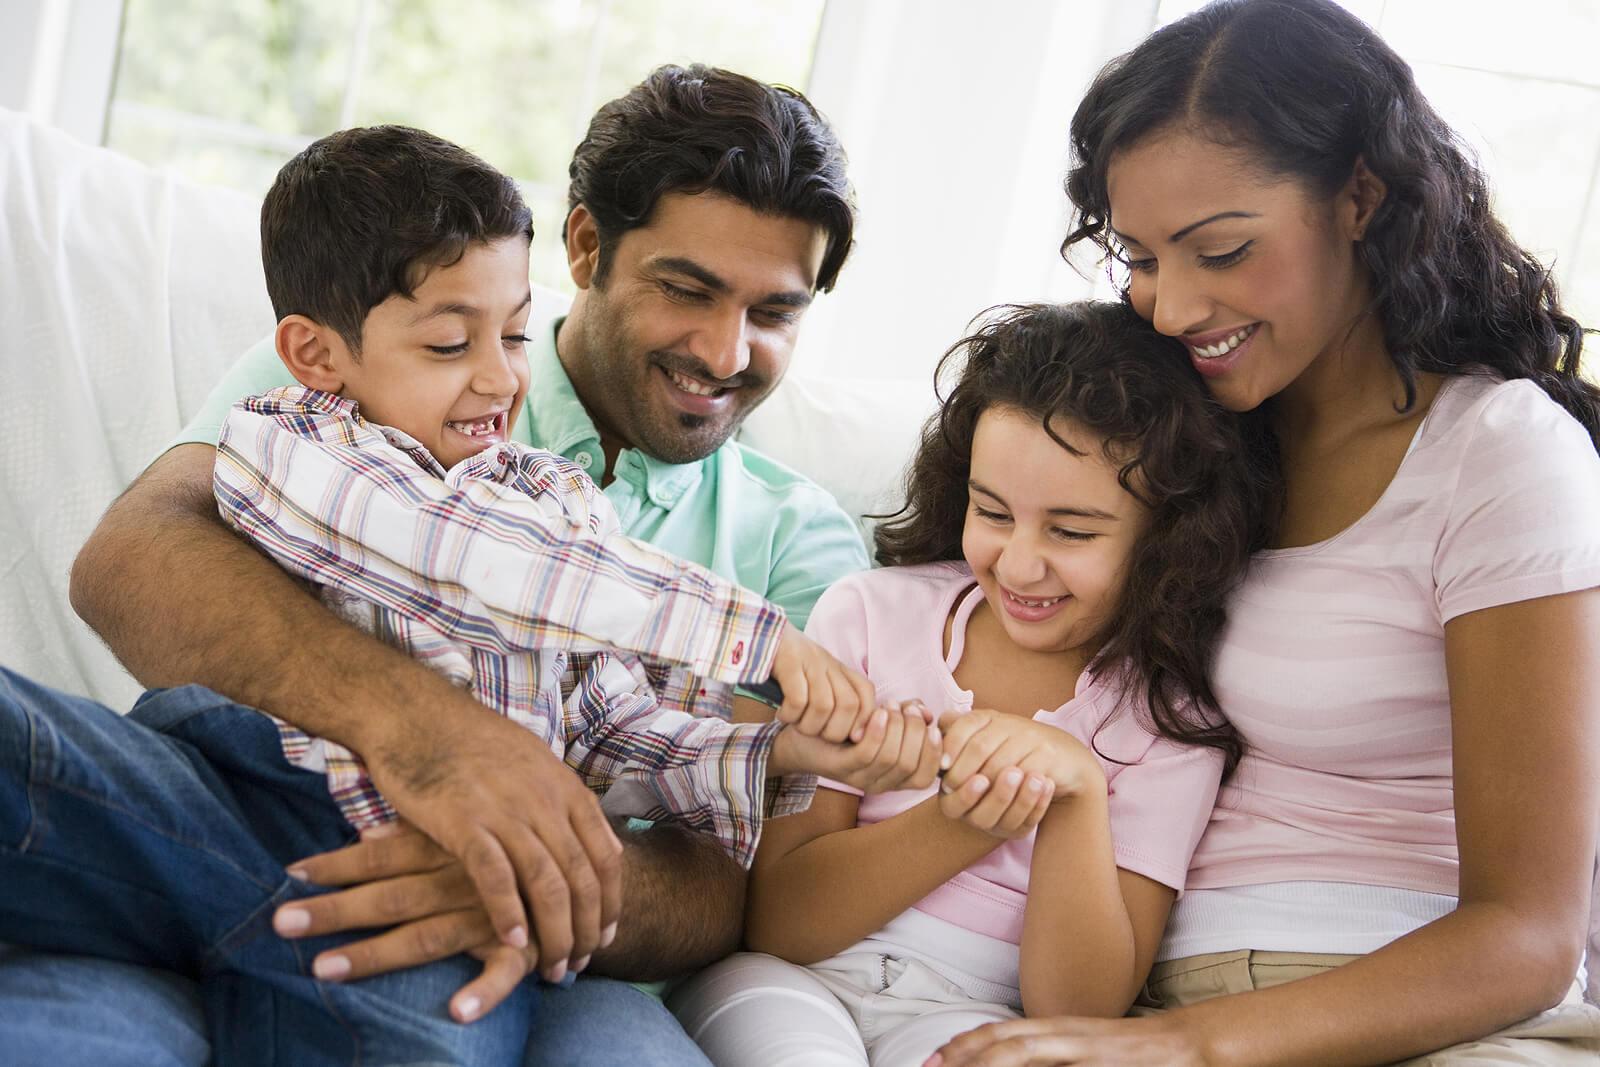 Padres abrazando a sus hijos.